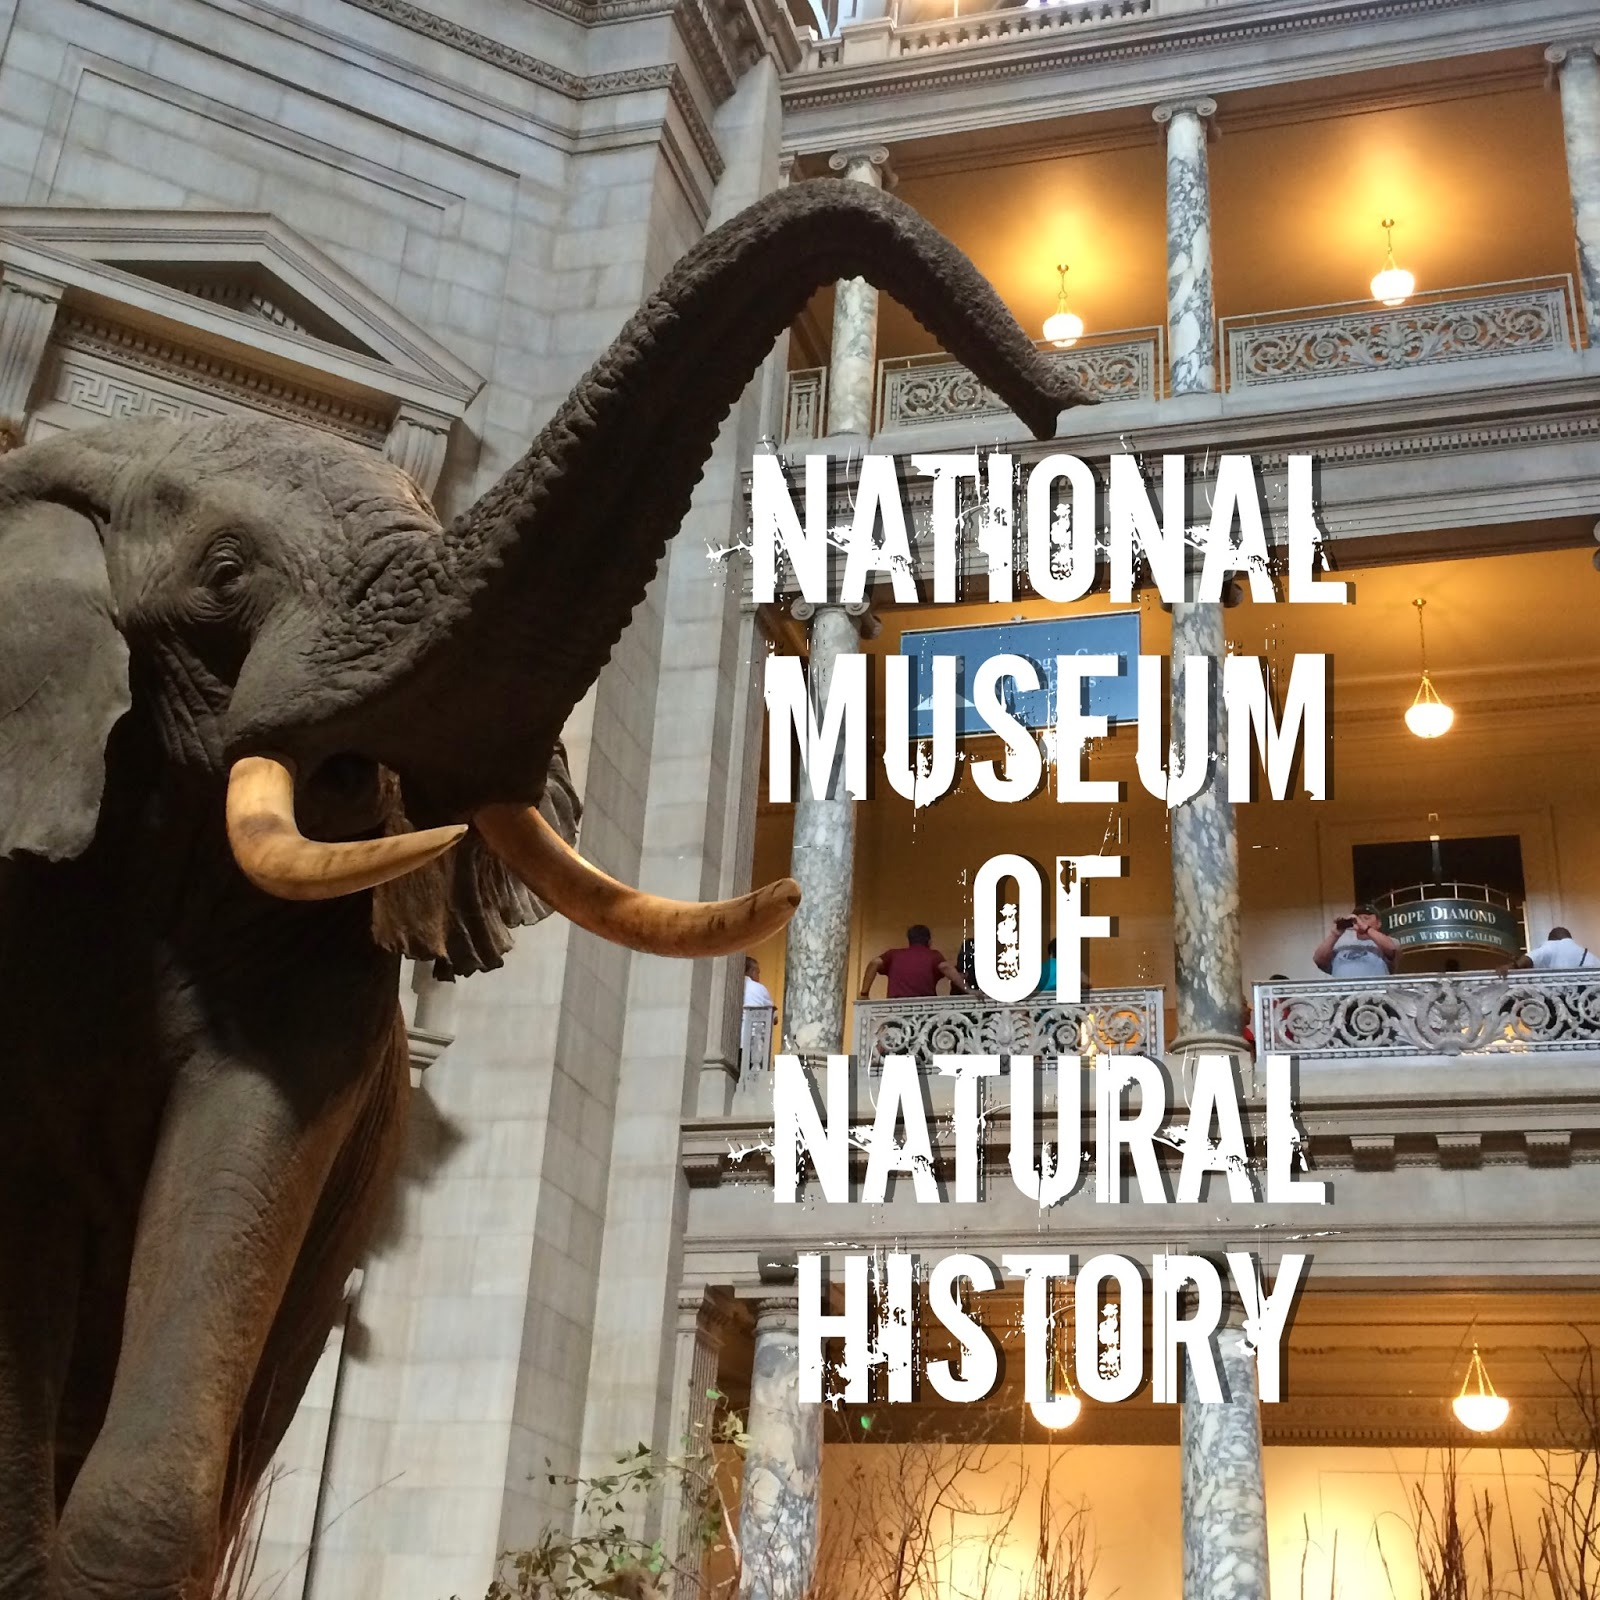 http://melthemidnightbaker.blogspot.com/2014/06/natural-history-museum.html